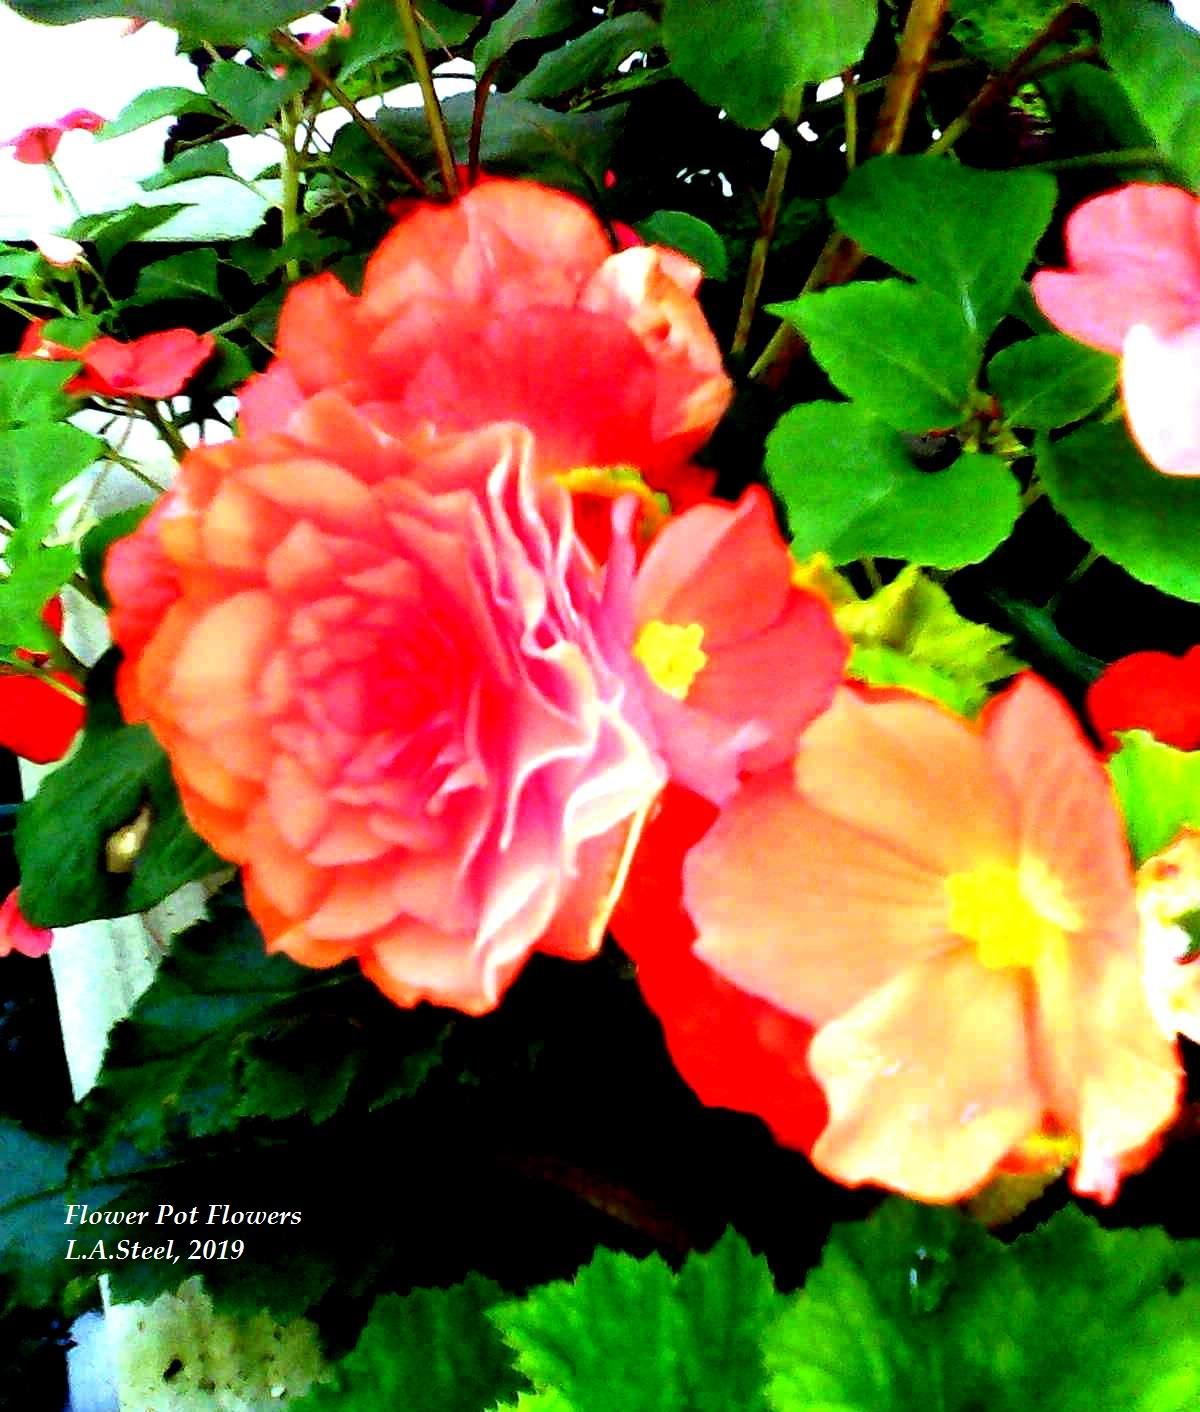 flower pot flowers 3 2019